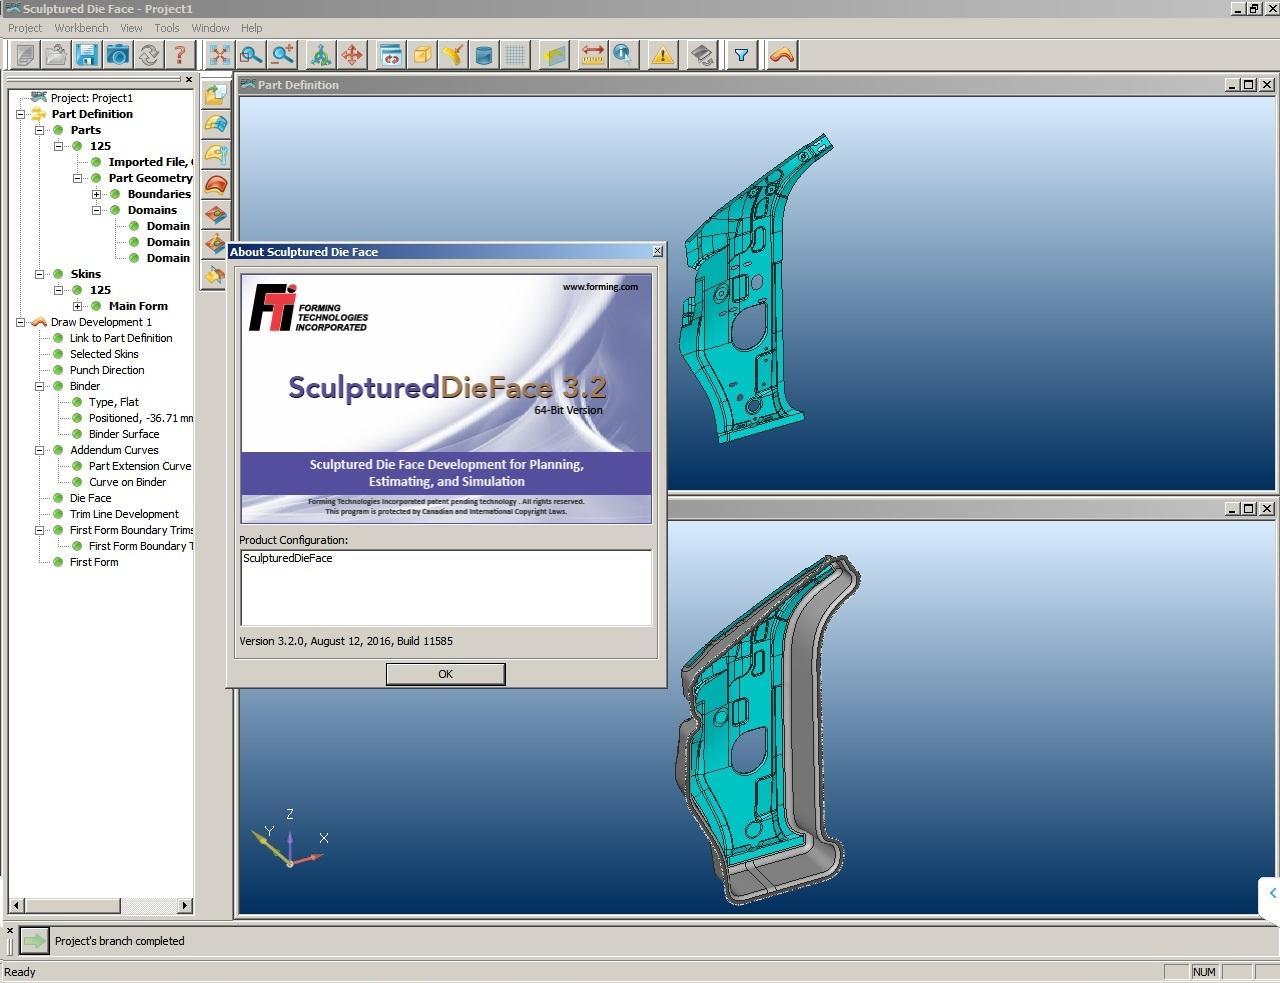 download FTI Sculptured Die Face 3.2 Win64 full crack 100% working